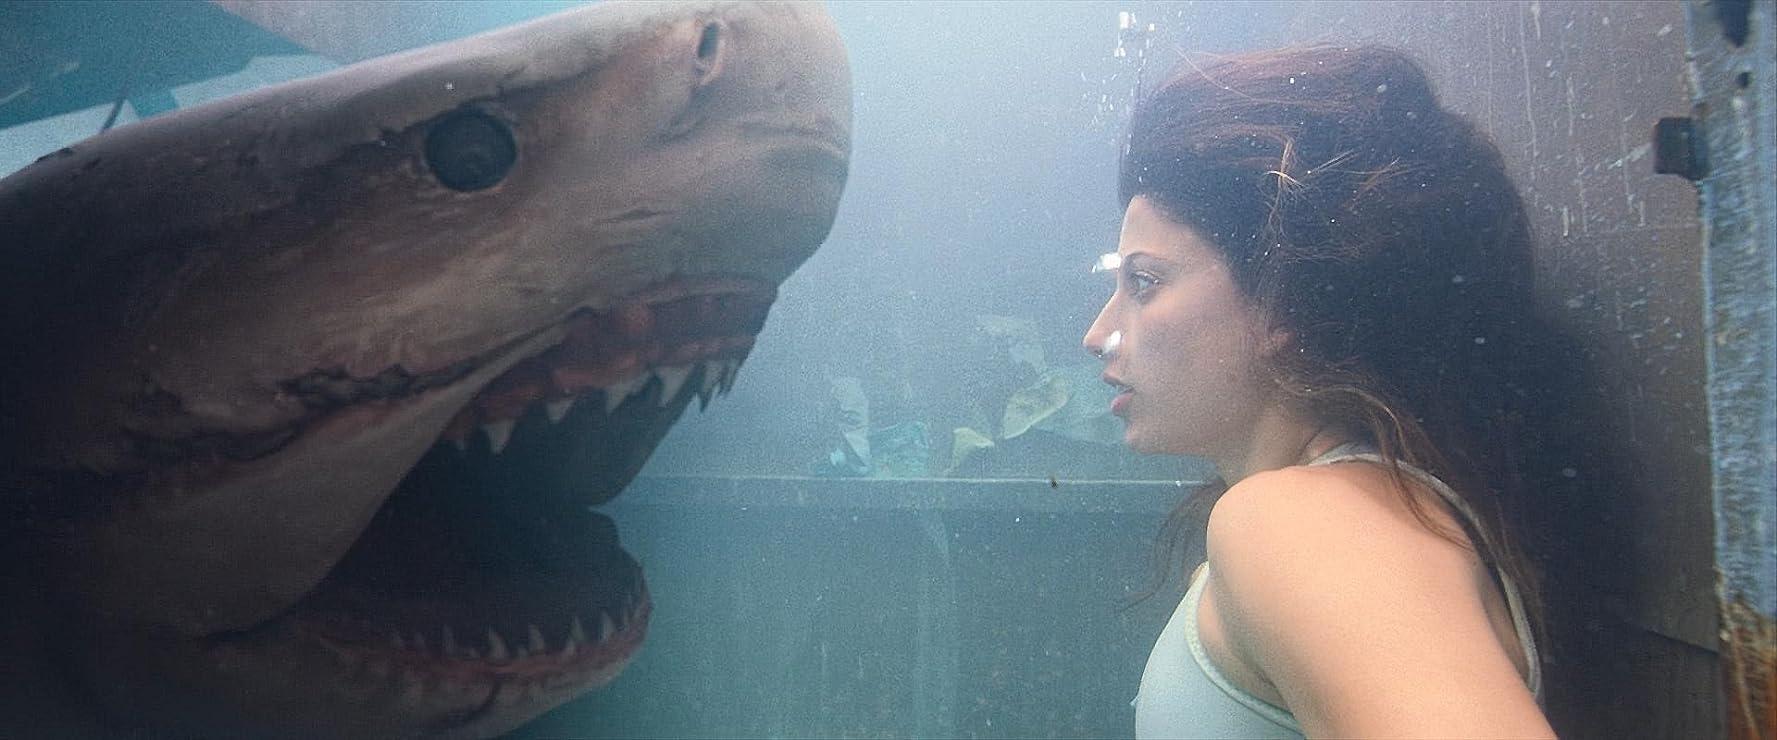 Deep Blue Sea 3 (2020) HD